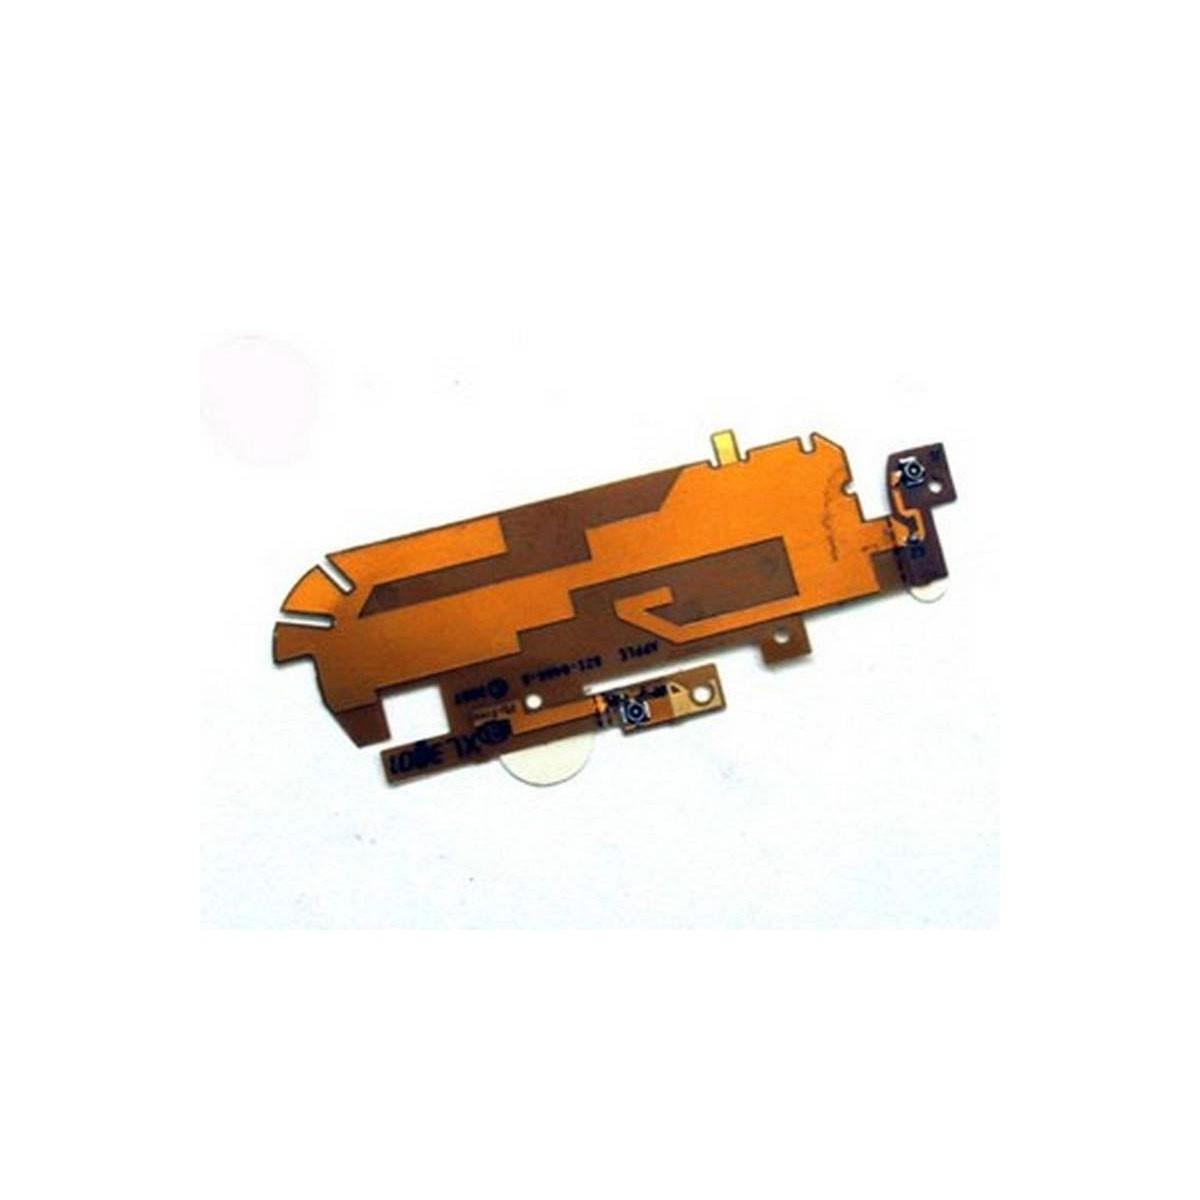 iPhone 2G cabo flex, modulo antena